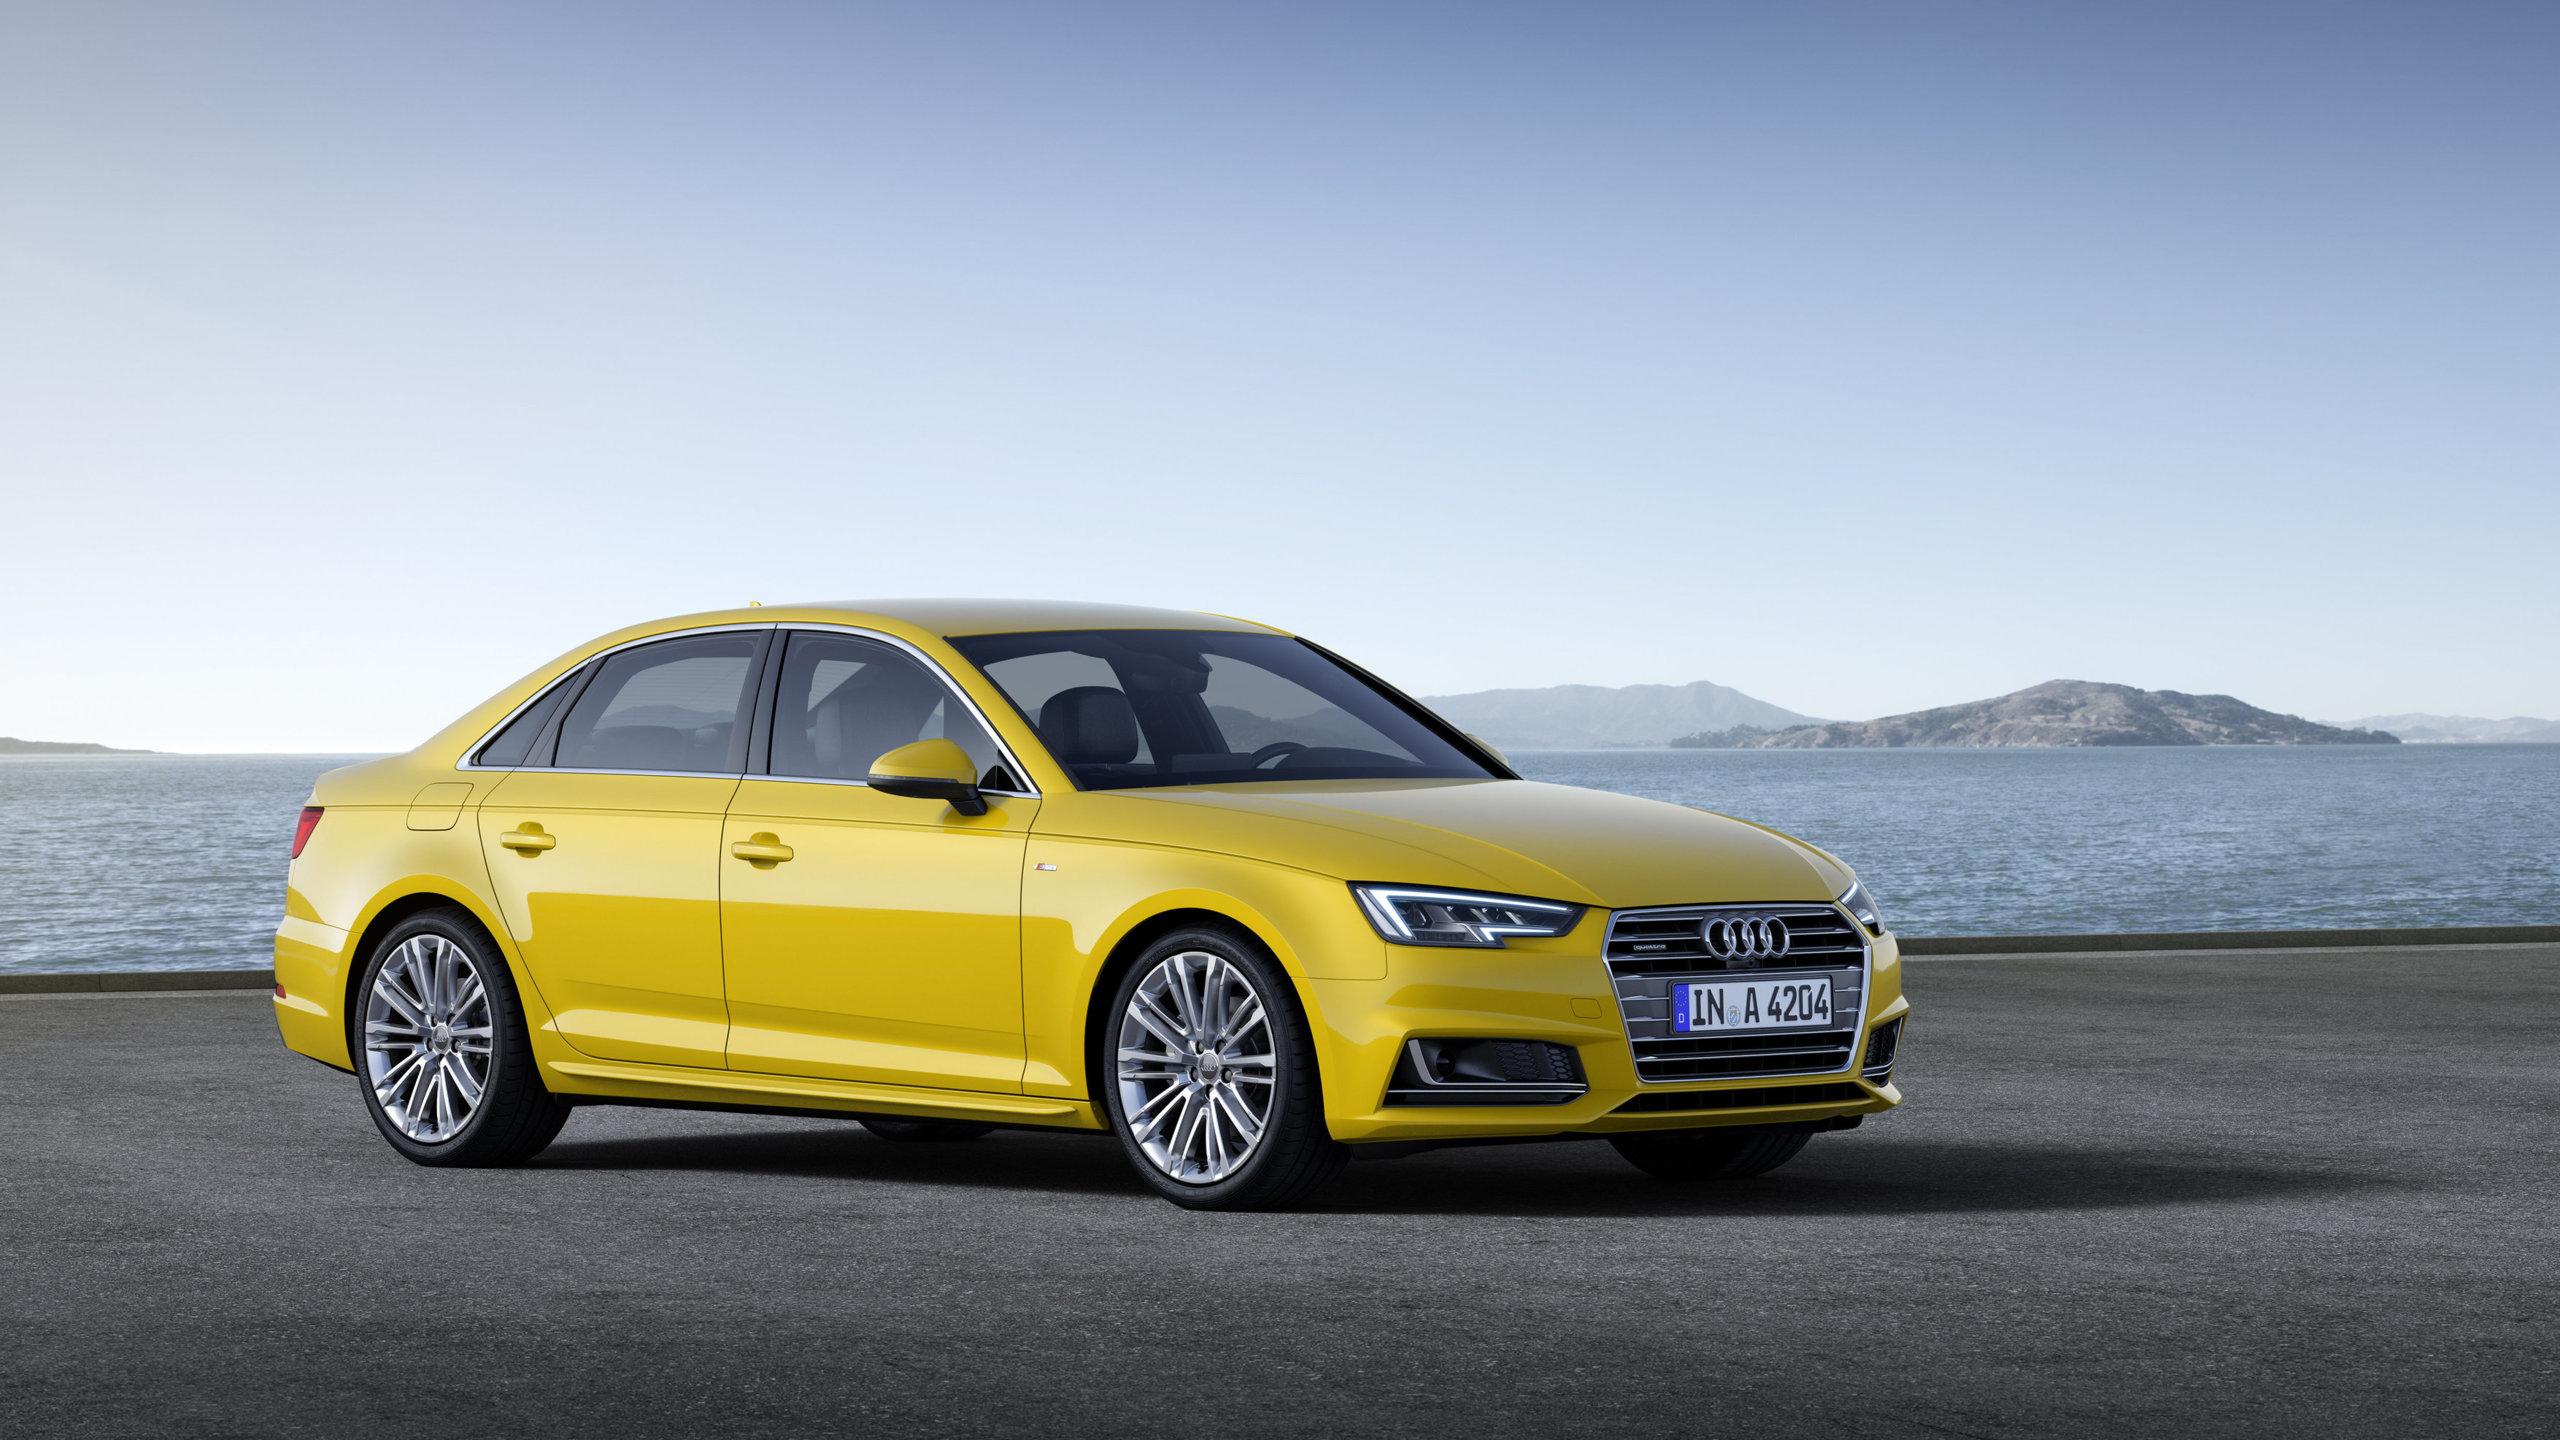 Audi A4 2015 01